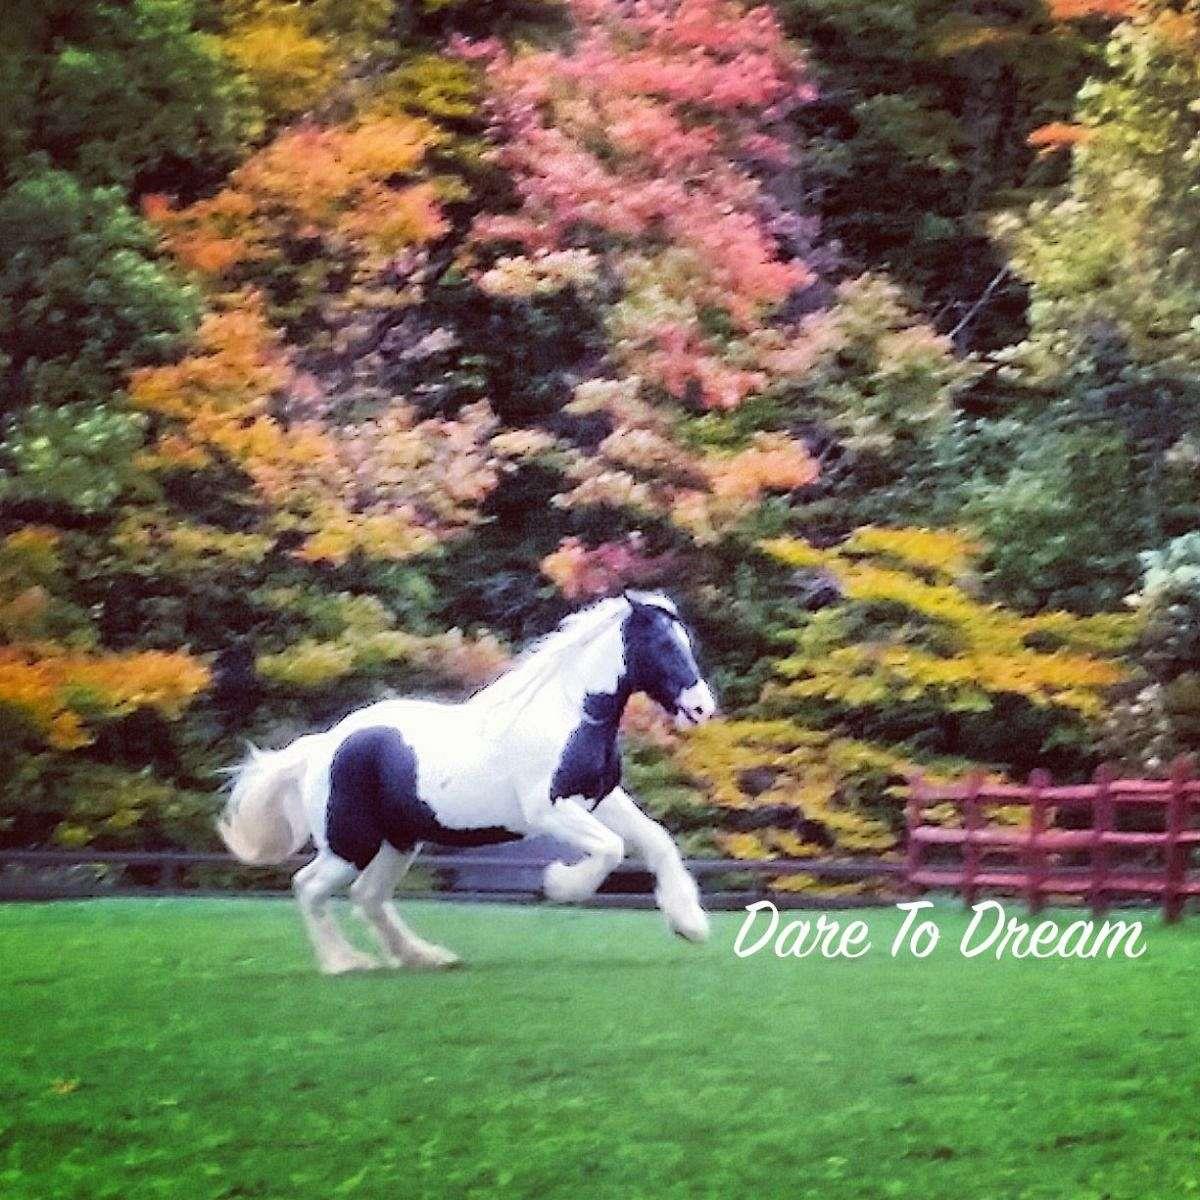 DTD Equestrian